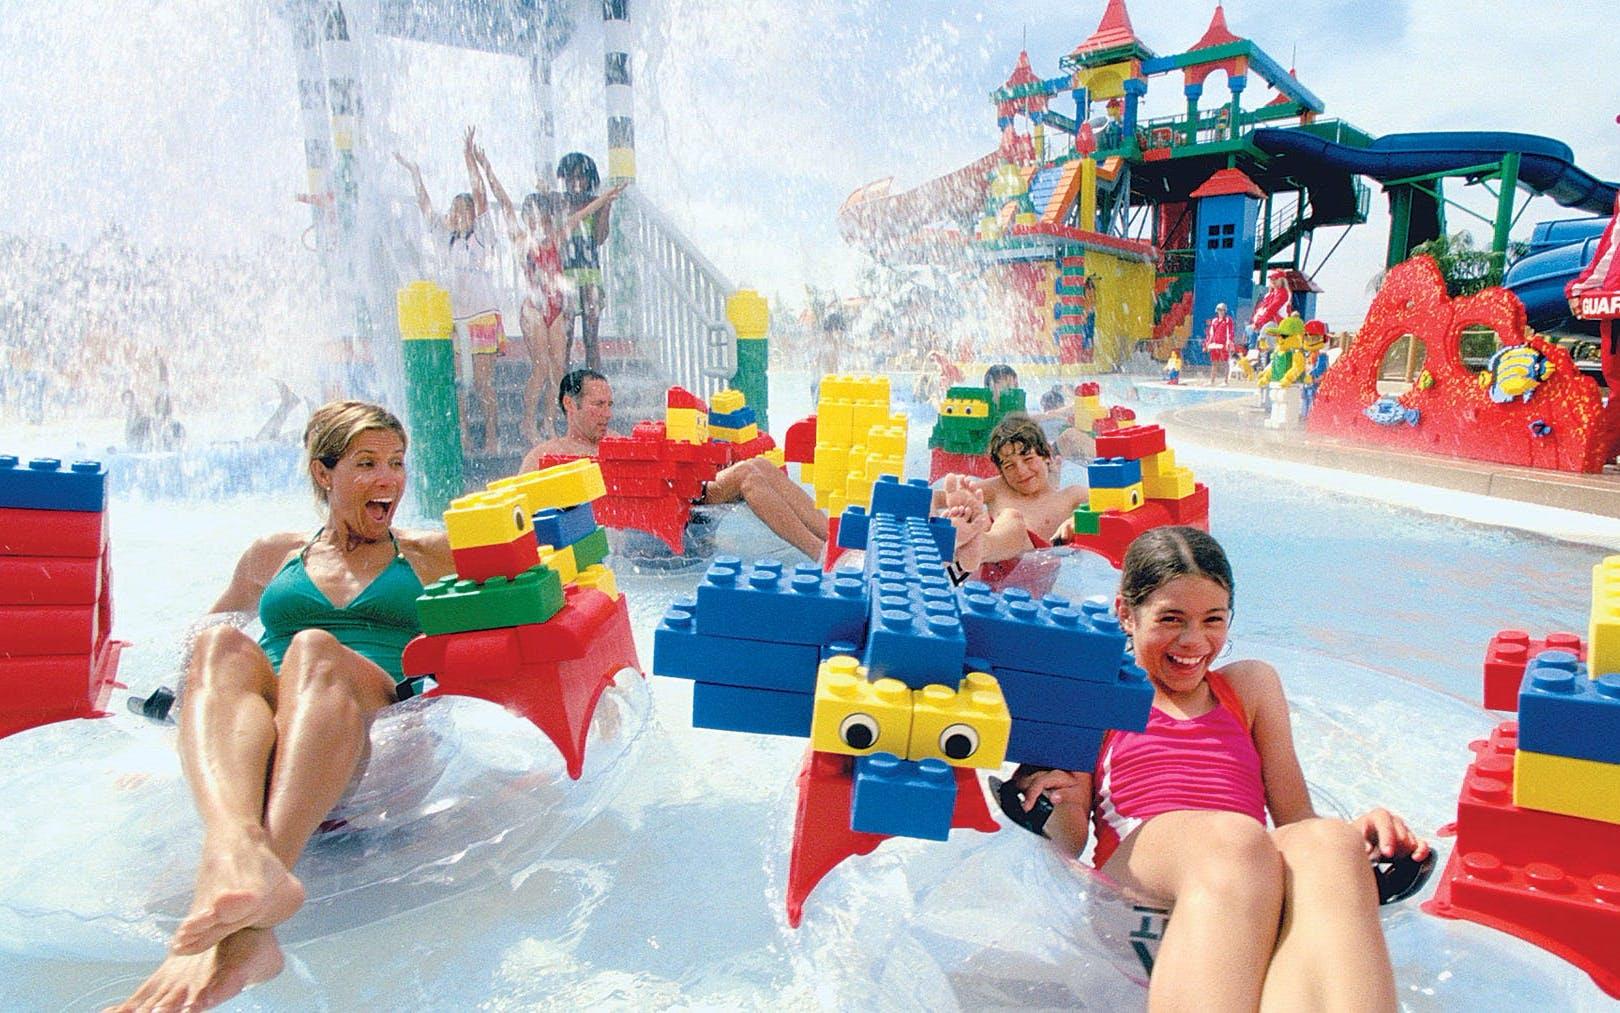 Best Water Park in Dubai -Ice Land Water Park